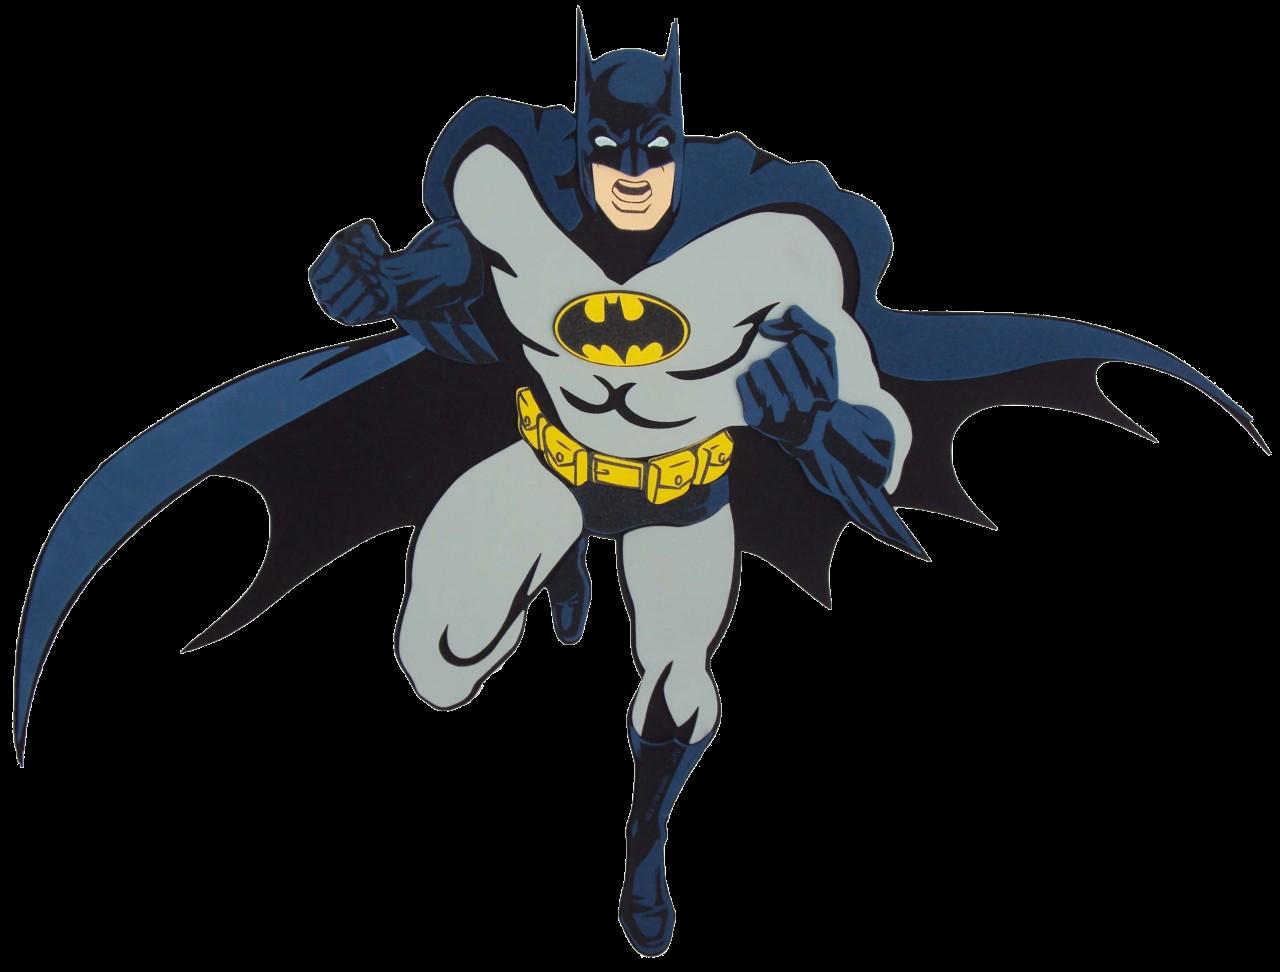 free png Batman Clipart images transparent